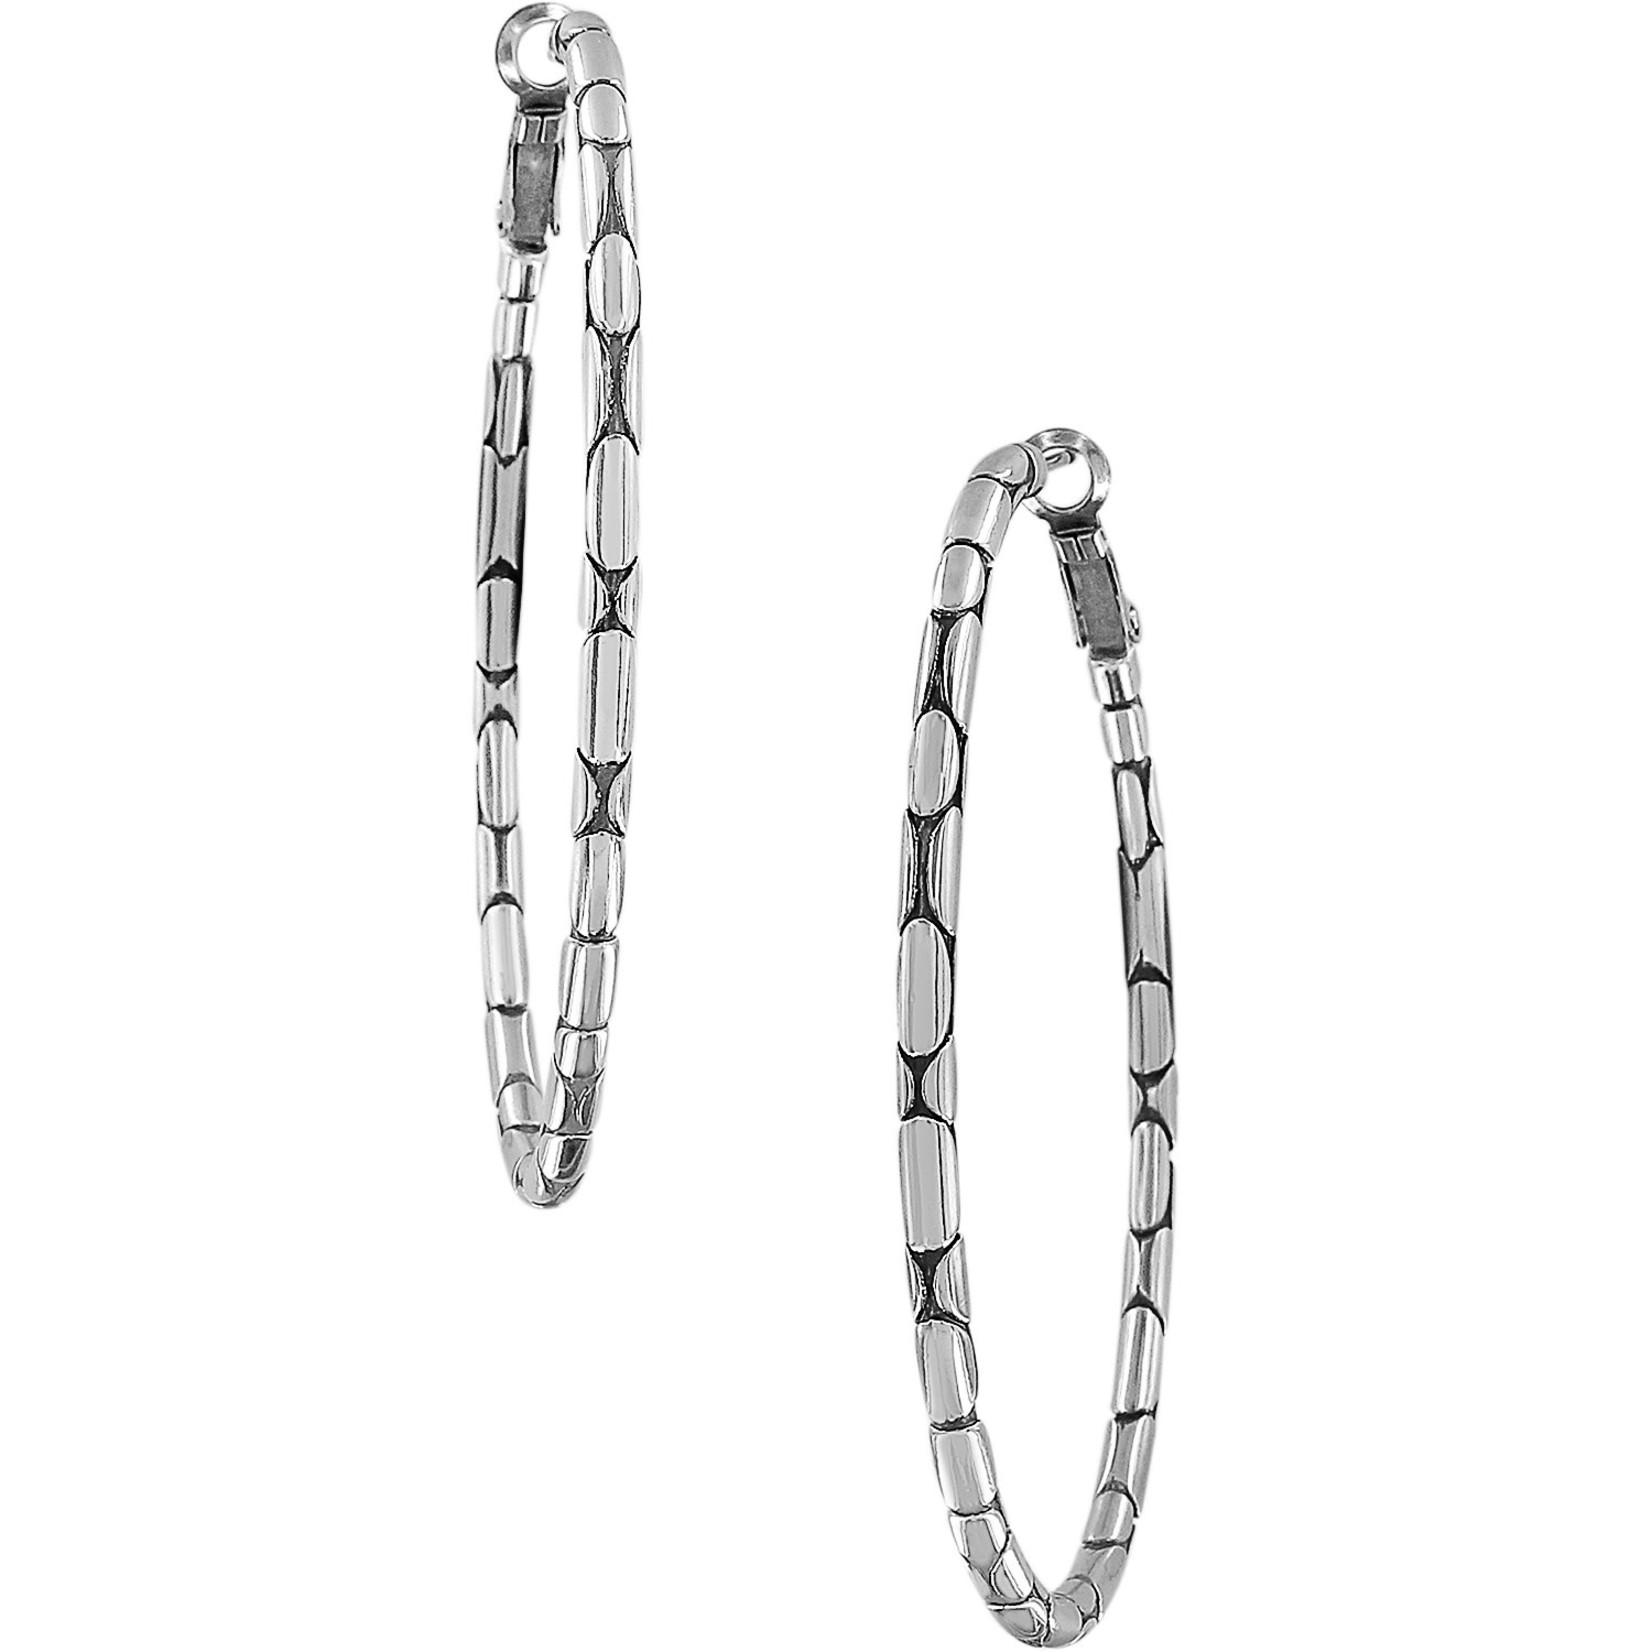 Brighton JA5400 Pebble Large Oval Hoop Earrings